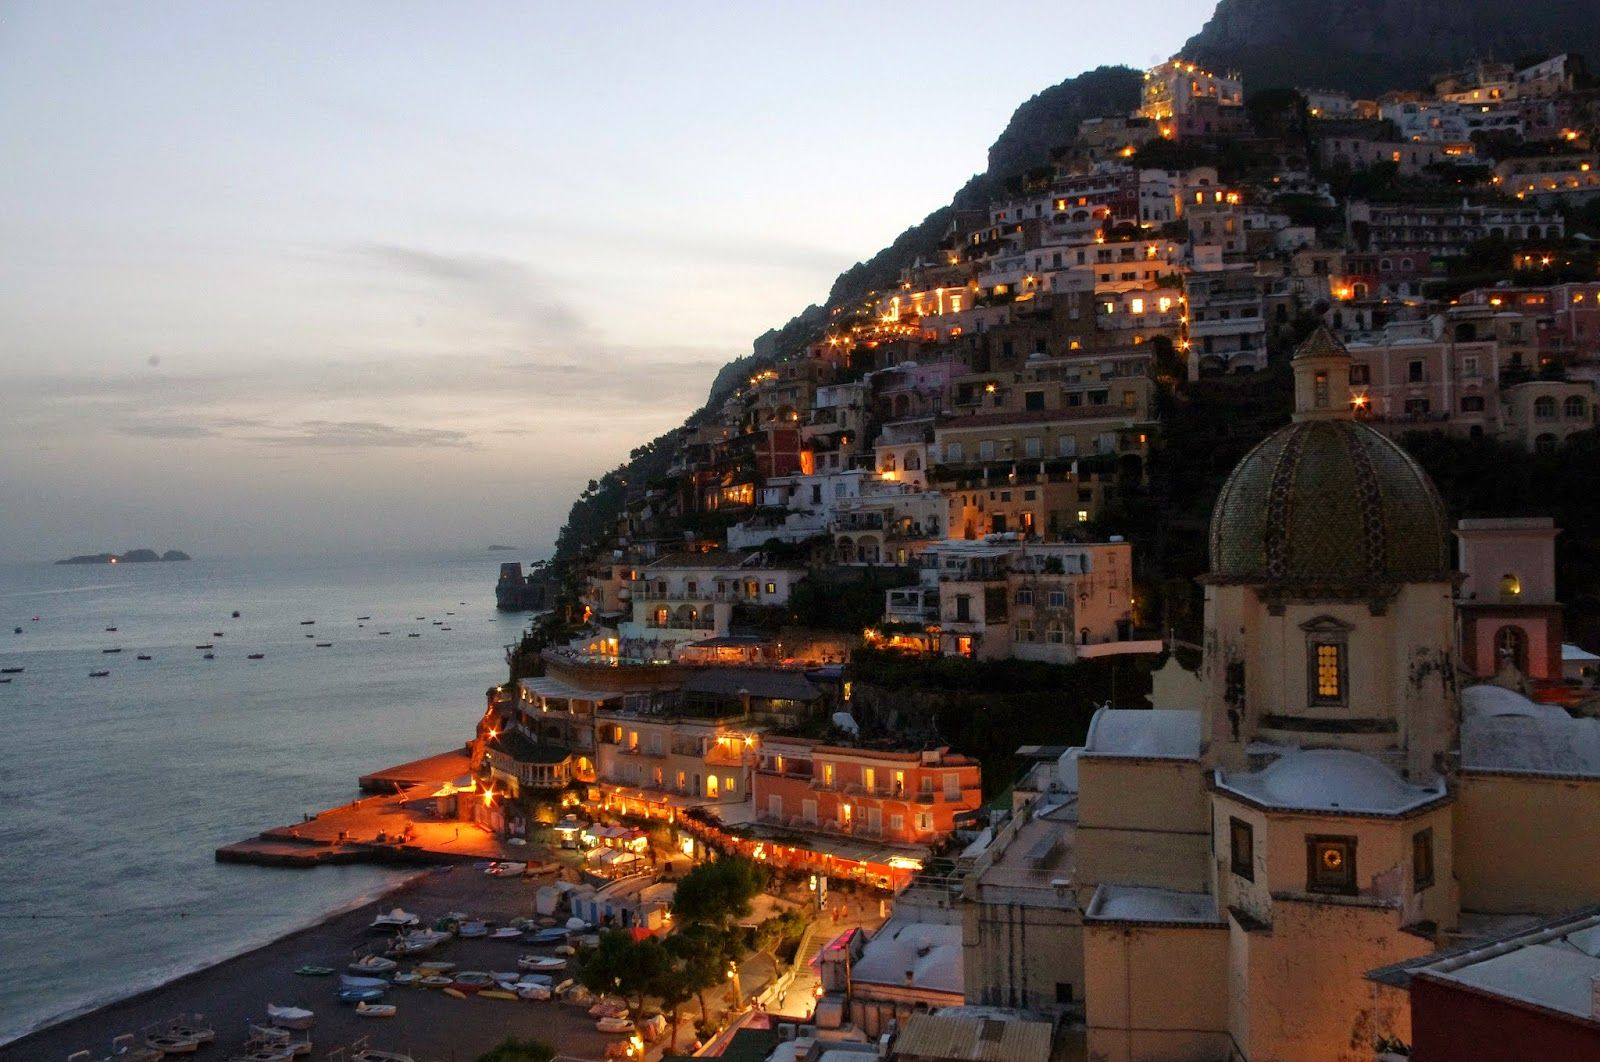 Pin on Travel Italy